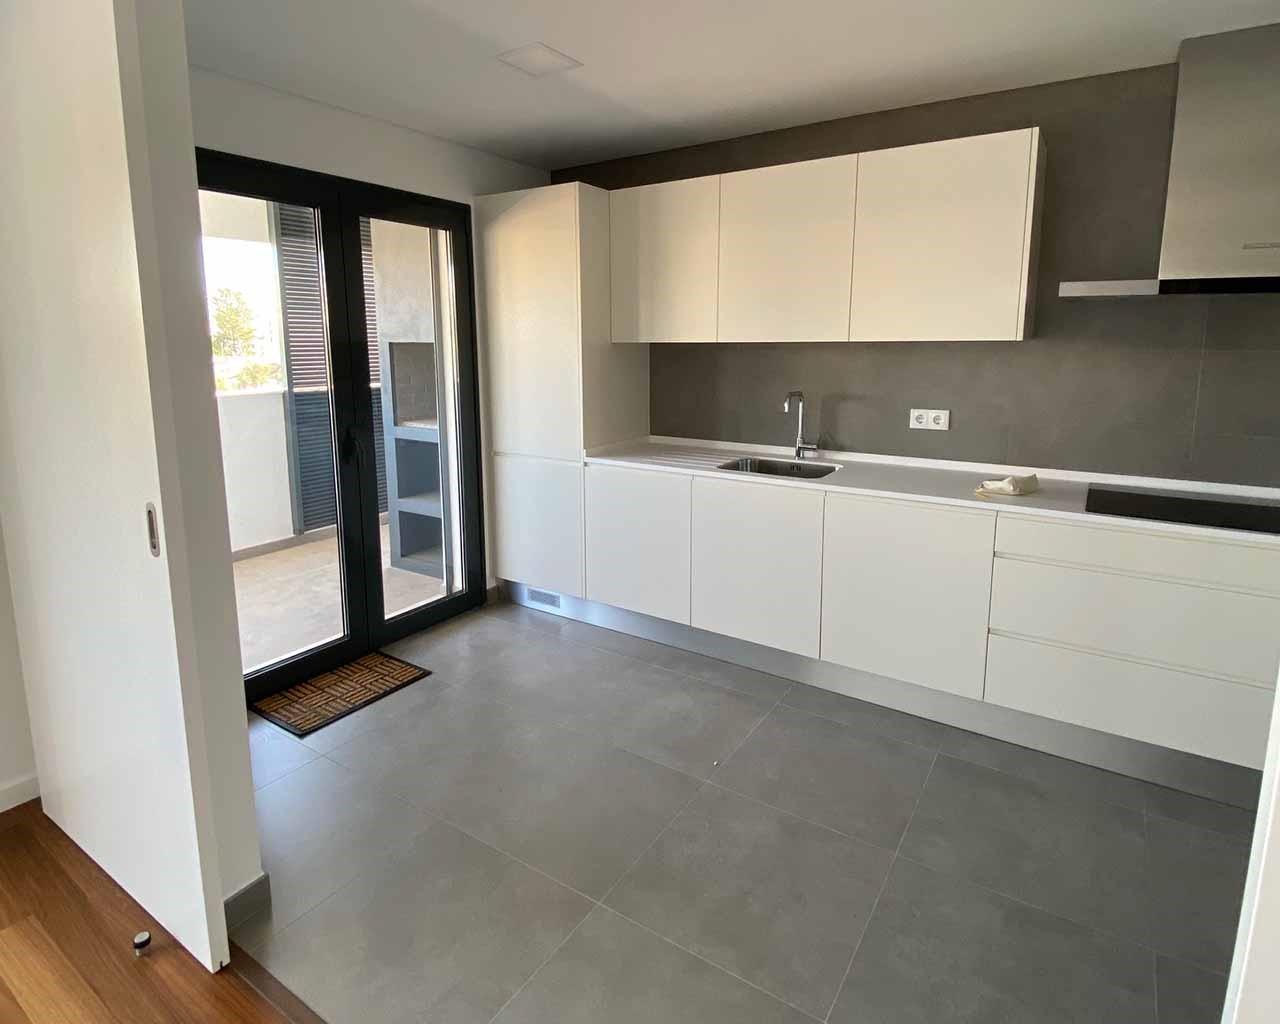 Faro-Lux_Terrace - Kitchen